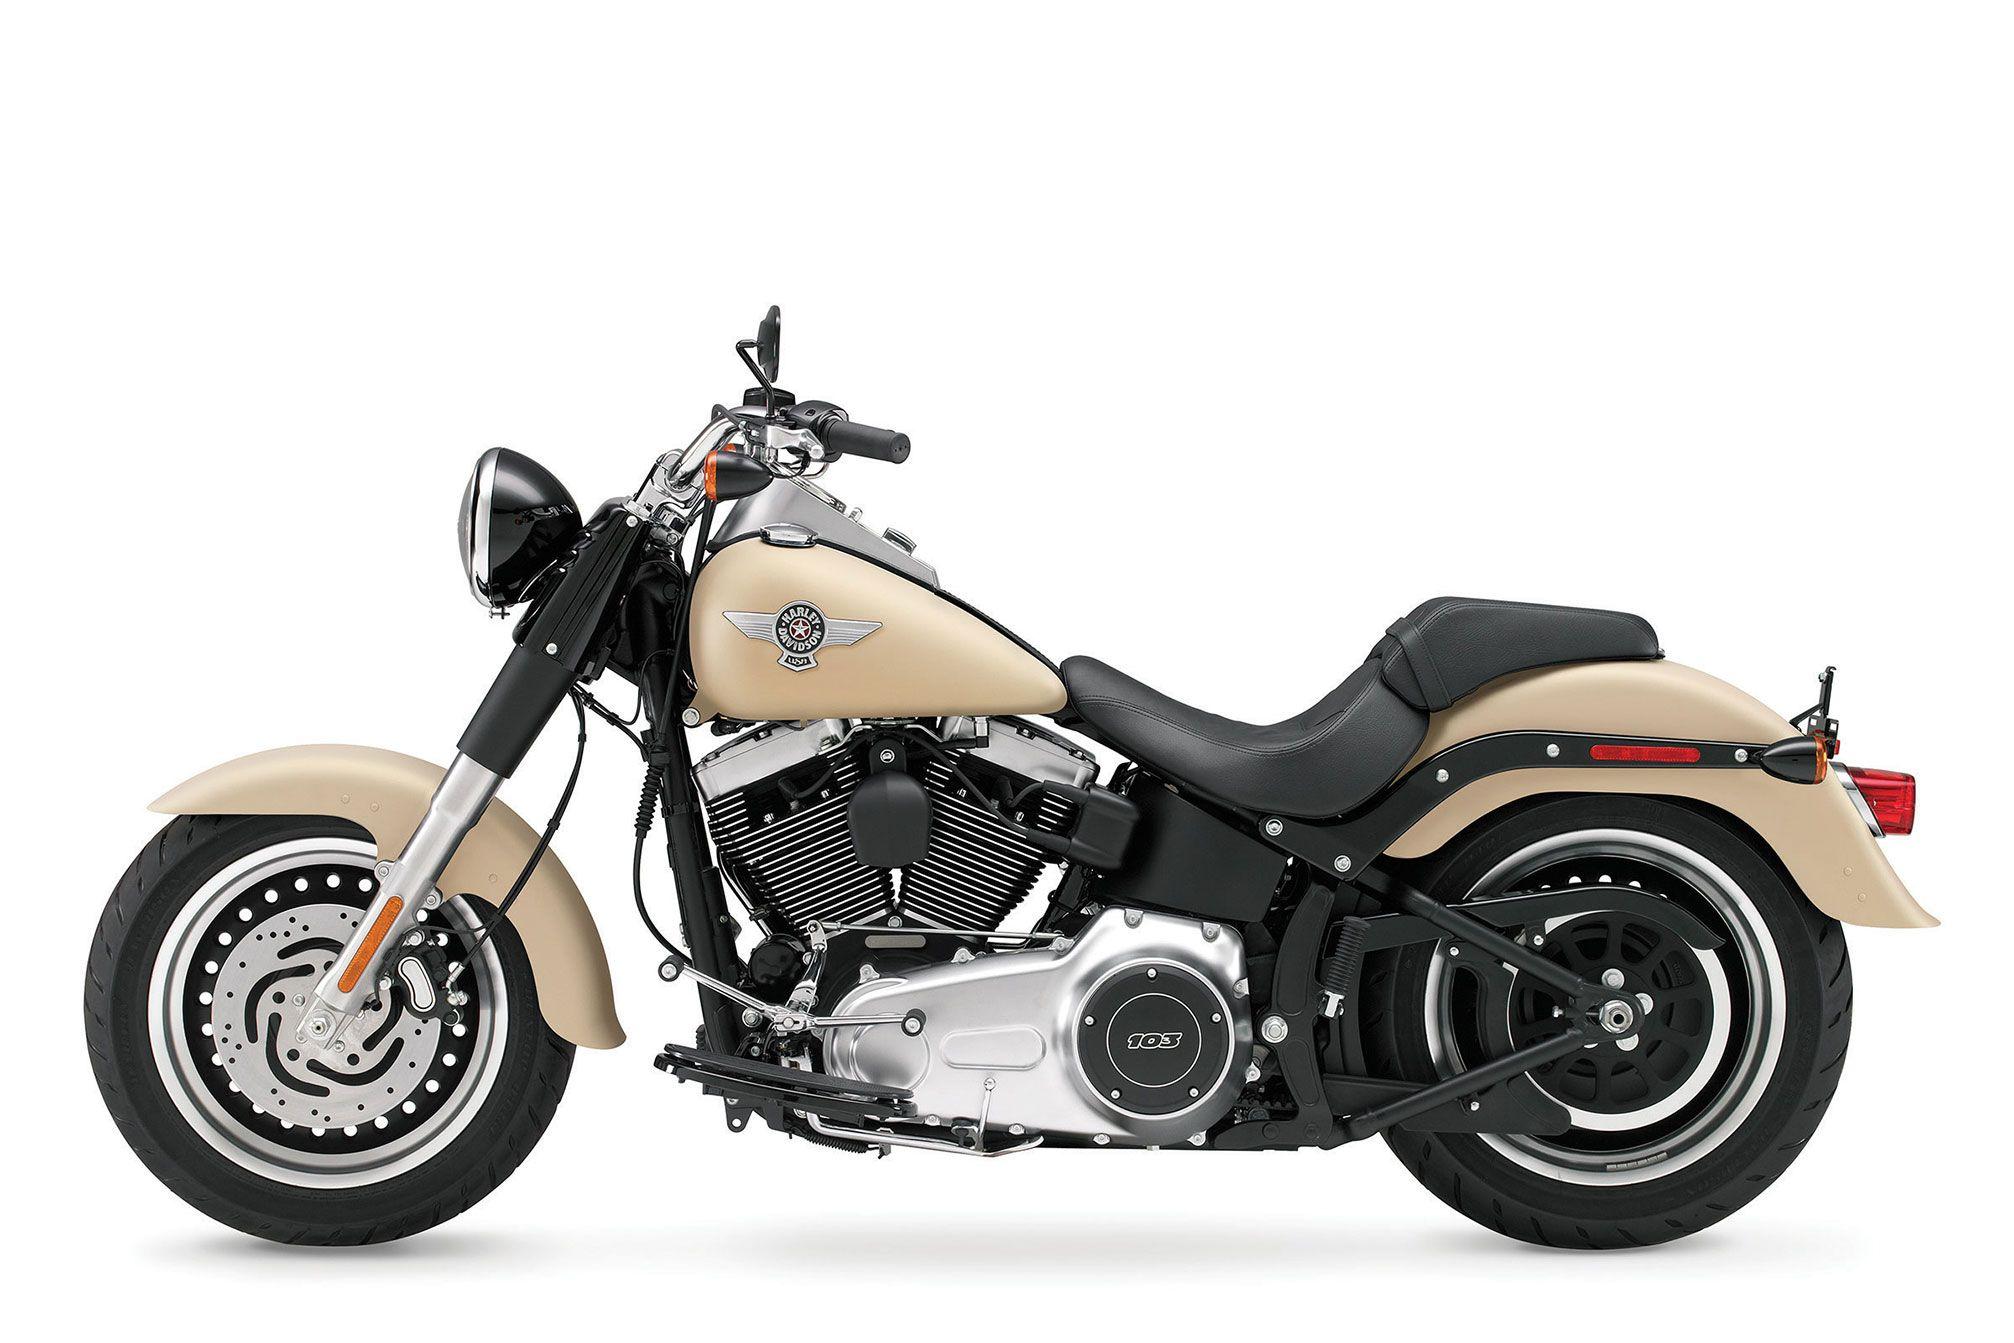 Harley Davidson Flstfb Wallpapers Harley Davidson Motos Wallpaper